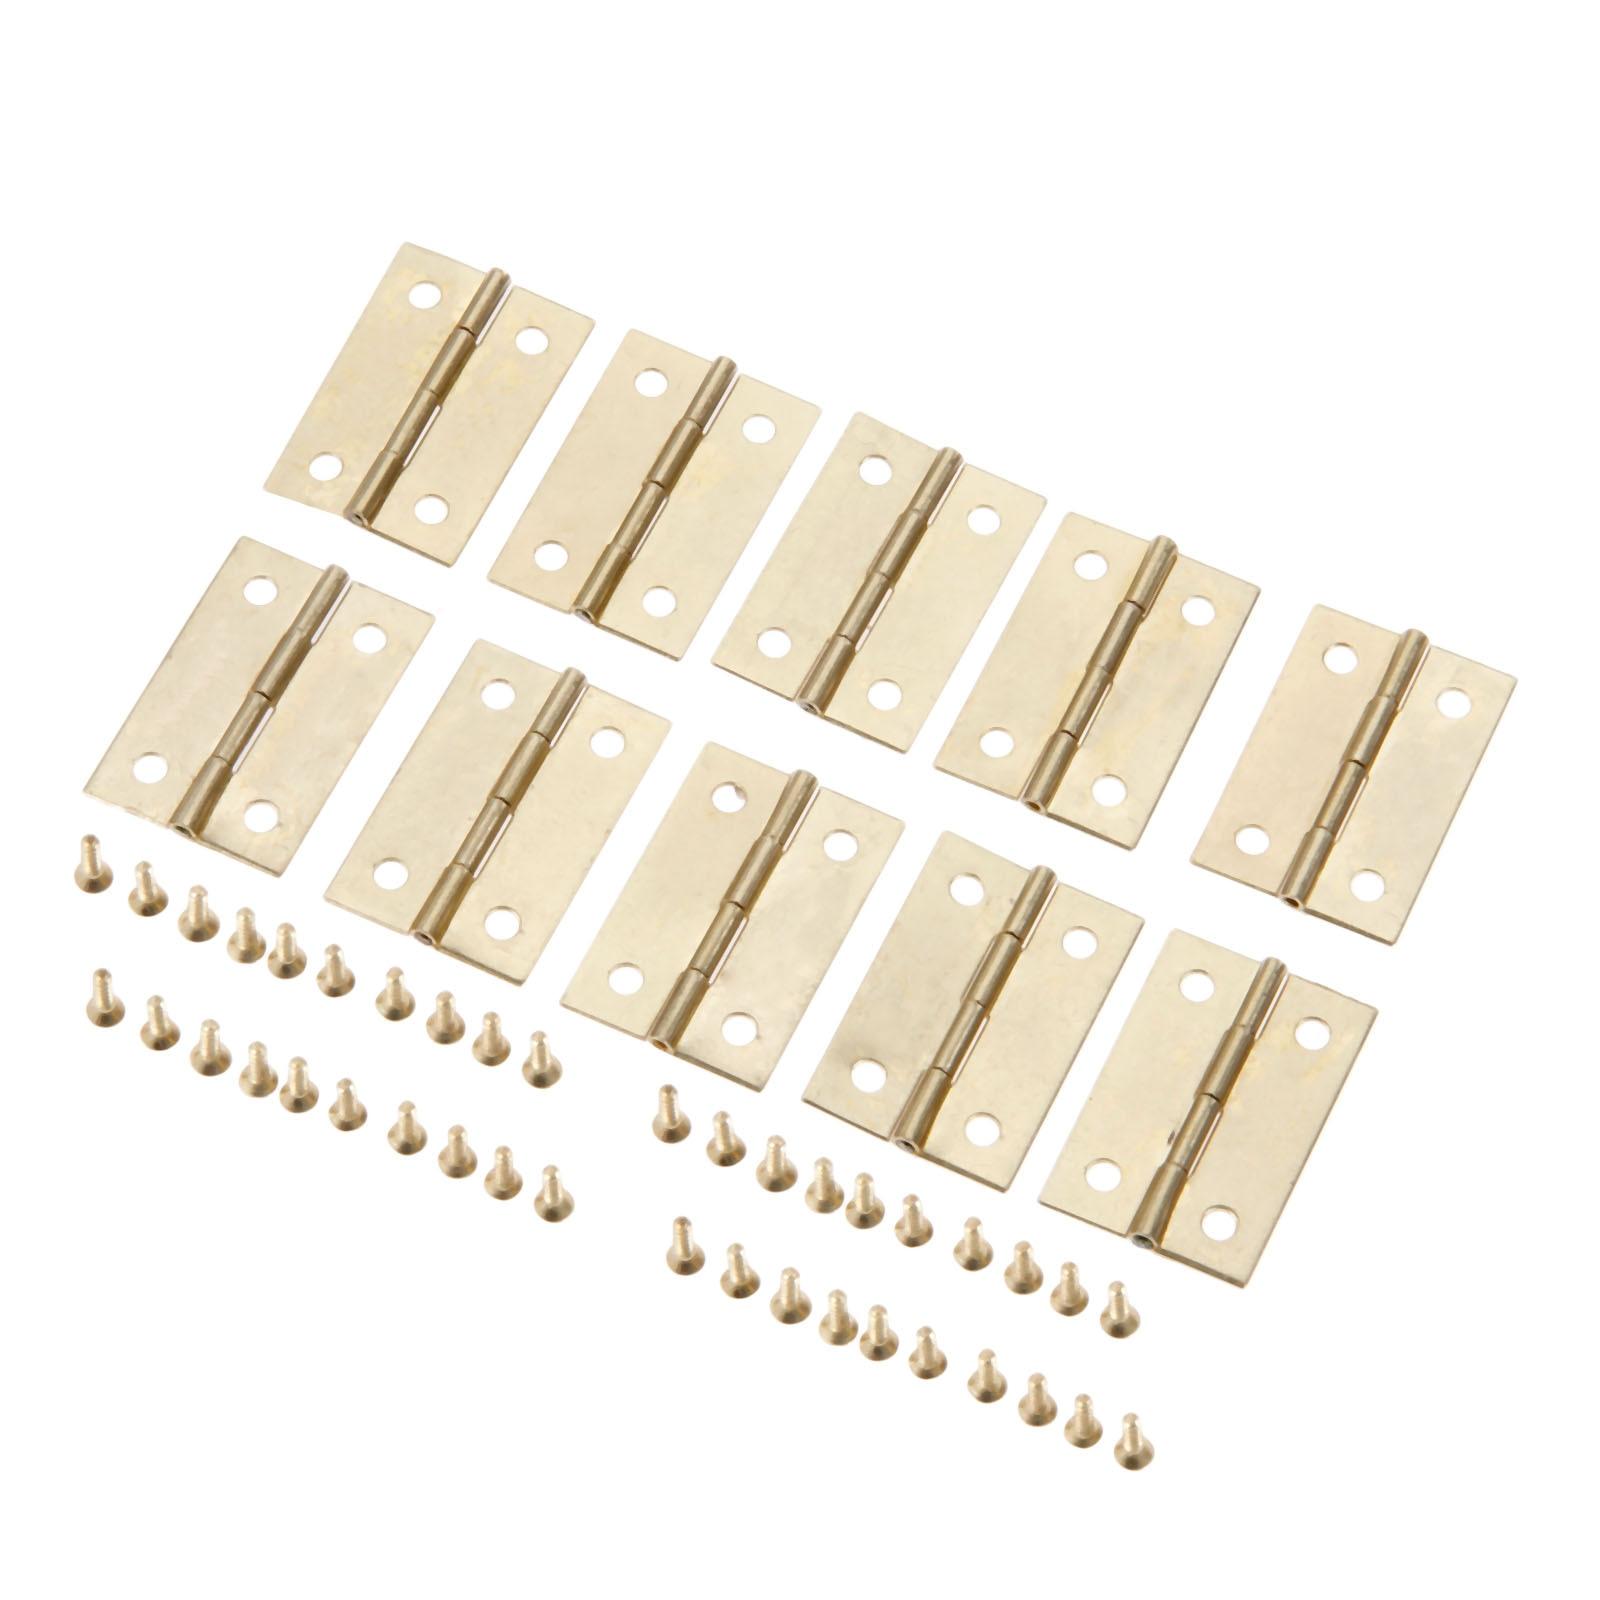 10Pcs 35x22mm Gold Furniture Cabinet Hinge Drawer Door Small Hinge 4 Hole Jewelry Wood Box Decorative Hinge Furniture Hardware in Cabinet Hinges from Home Improvement